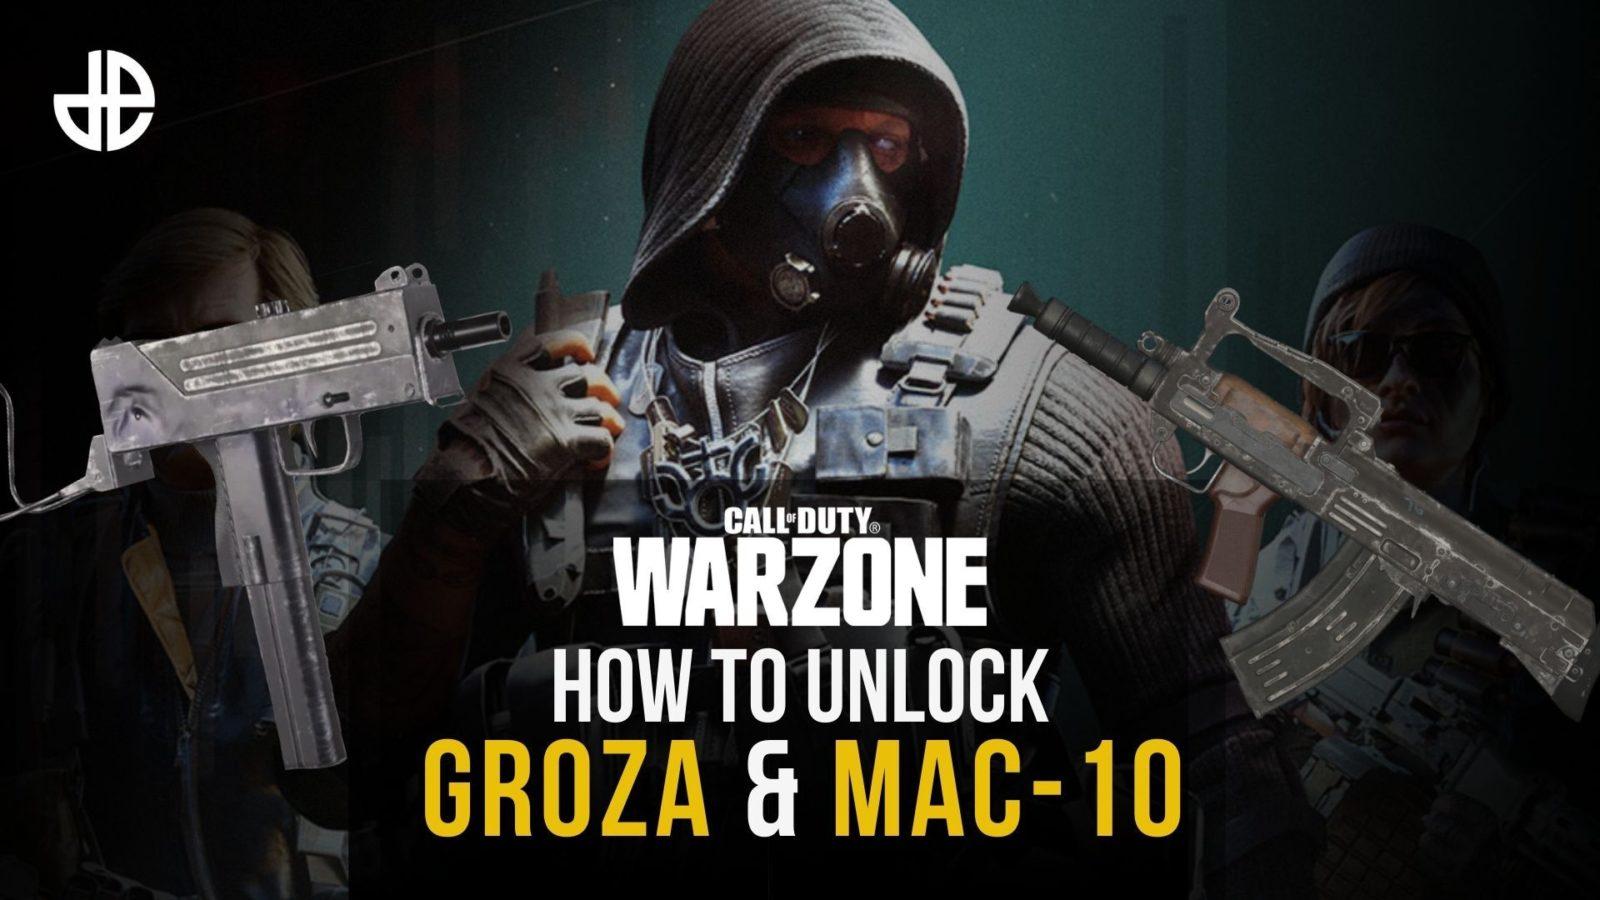 Groza and MAC-10